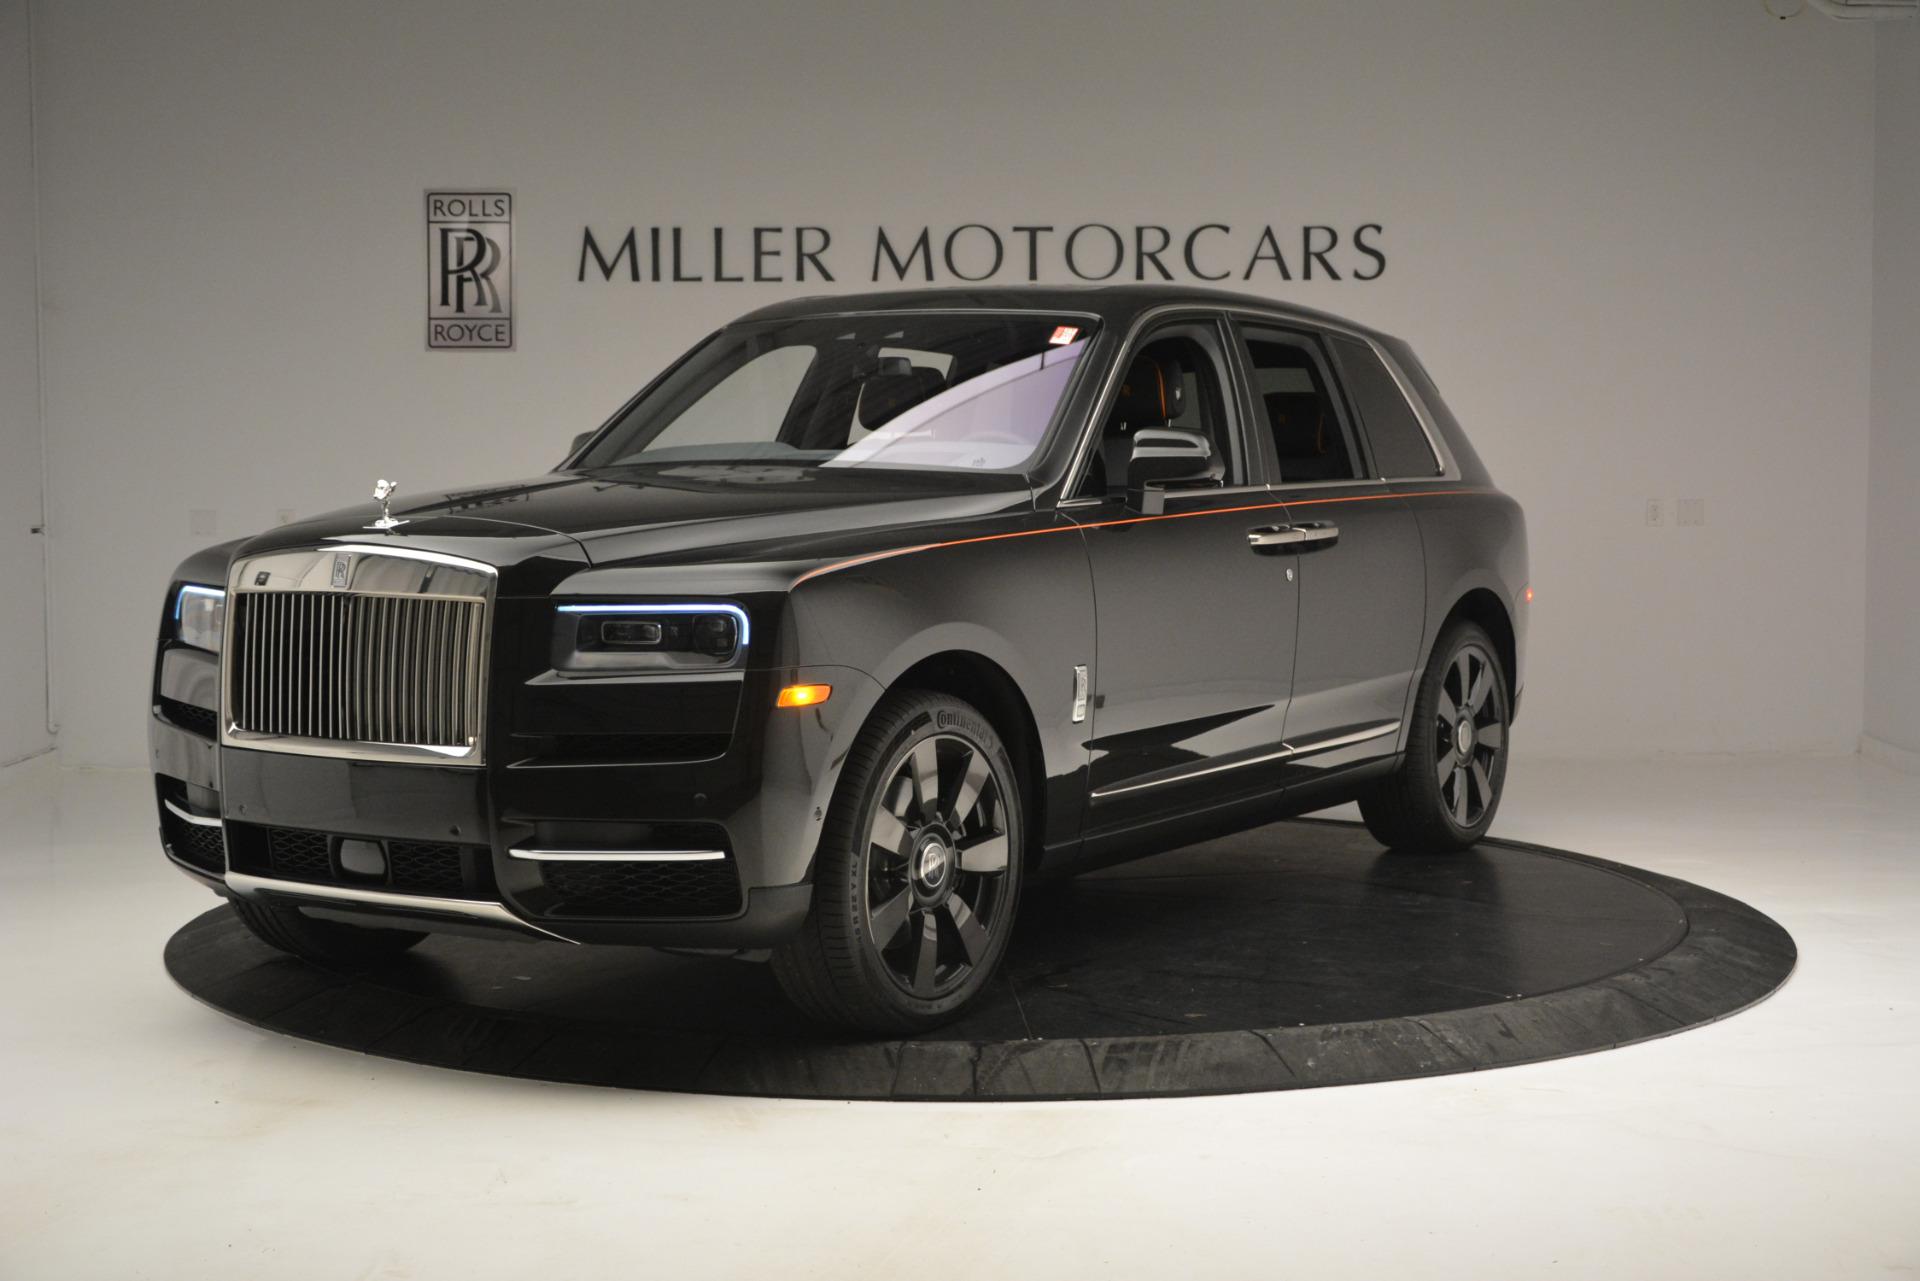 New 2019 Rolls-Royce Cullinan  For Sale 0 In Greenwich, CT